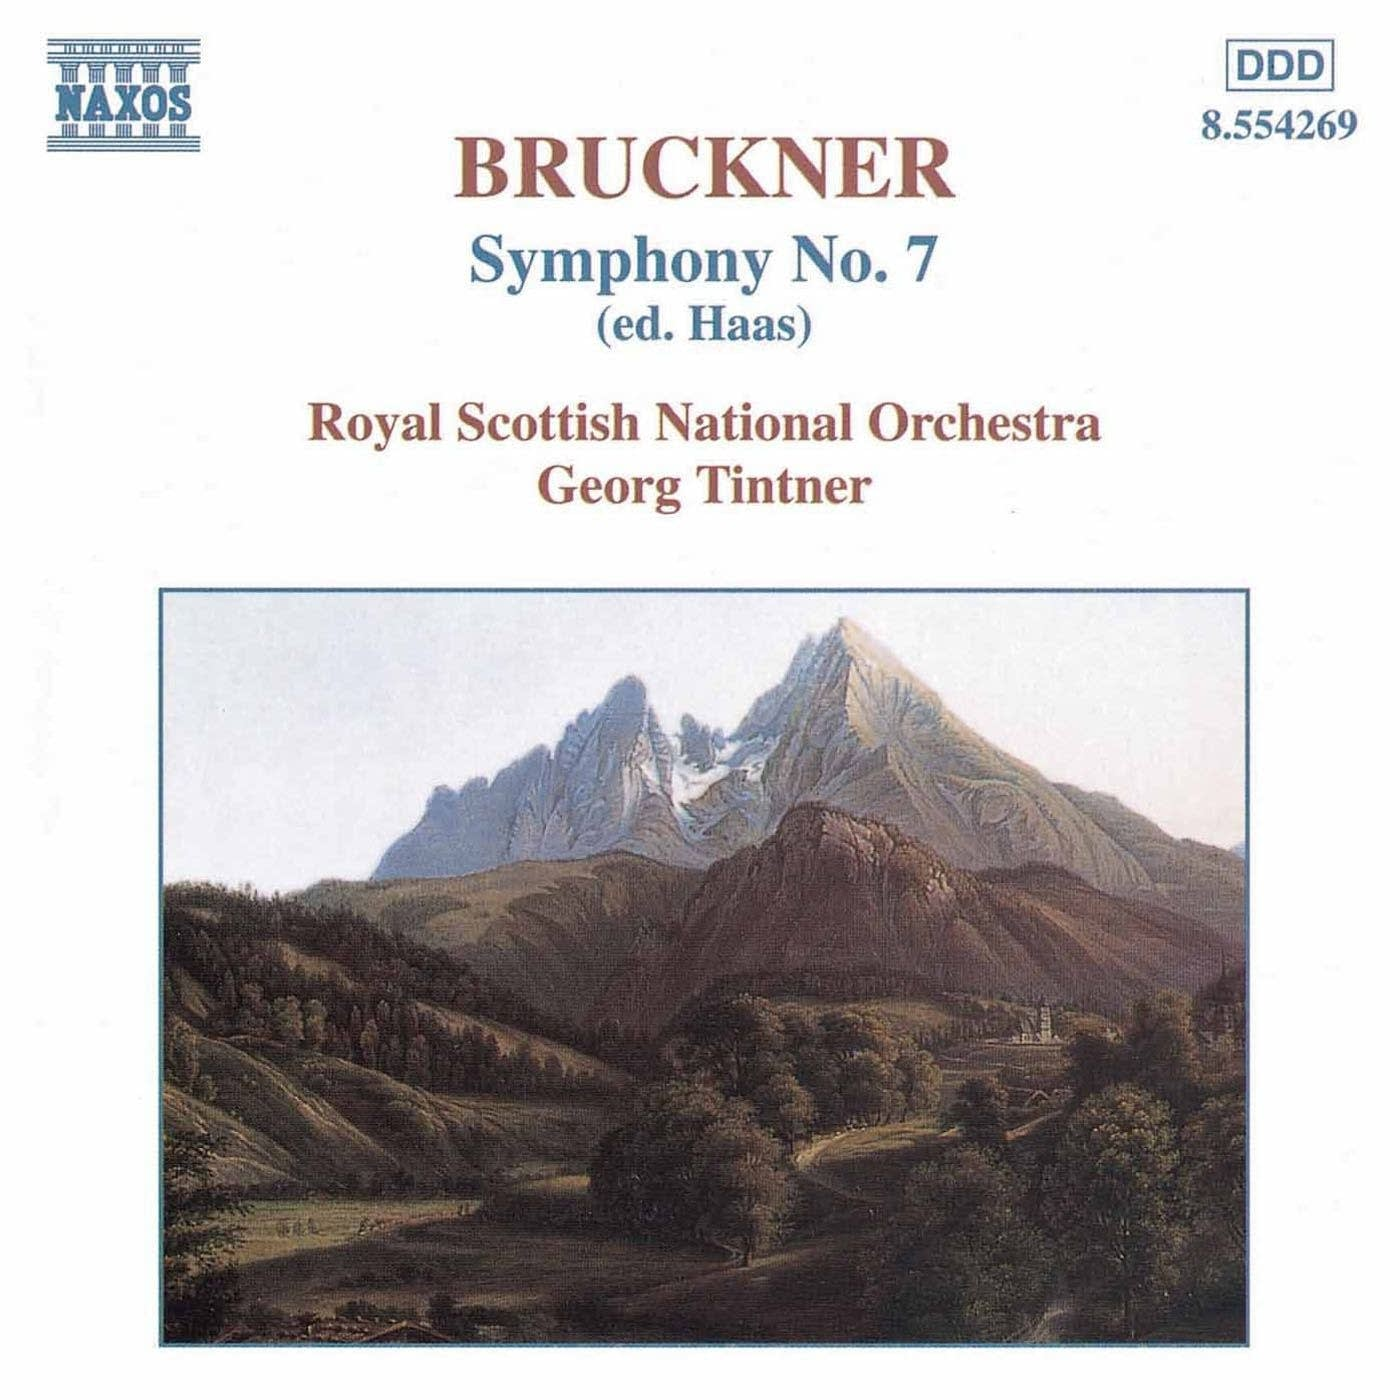 Anton Bruckner - Symphony No. 7: I. Allegro moderato